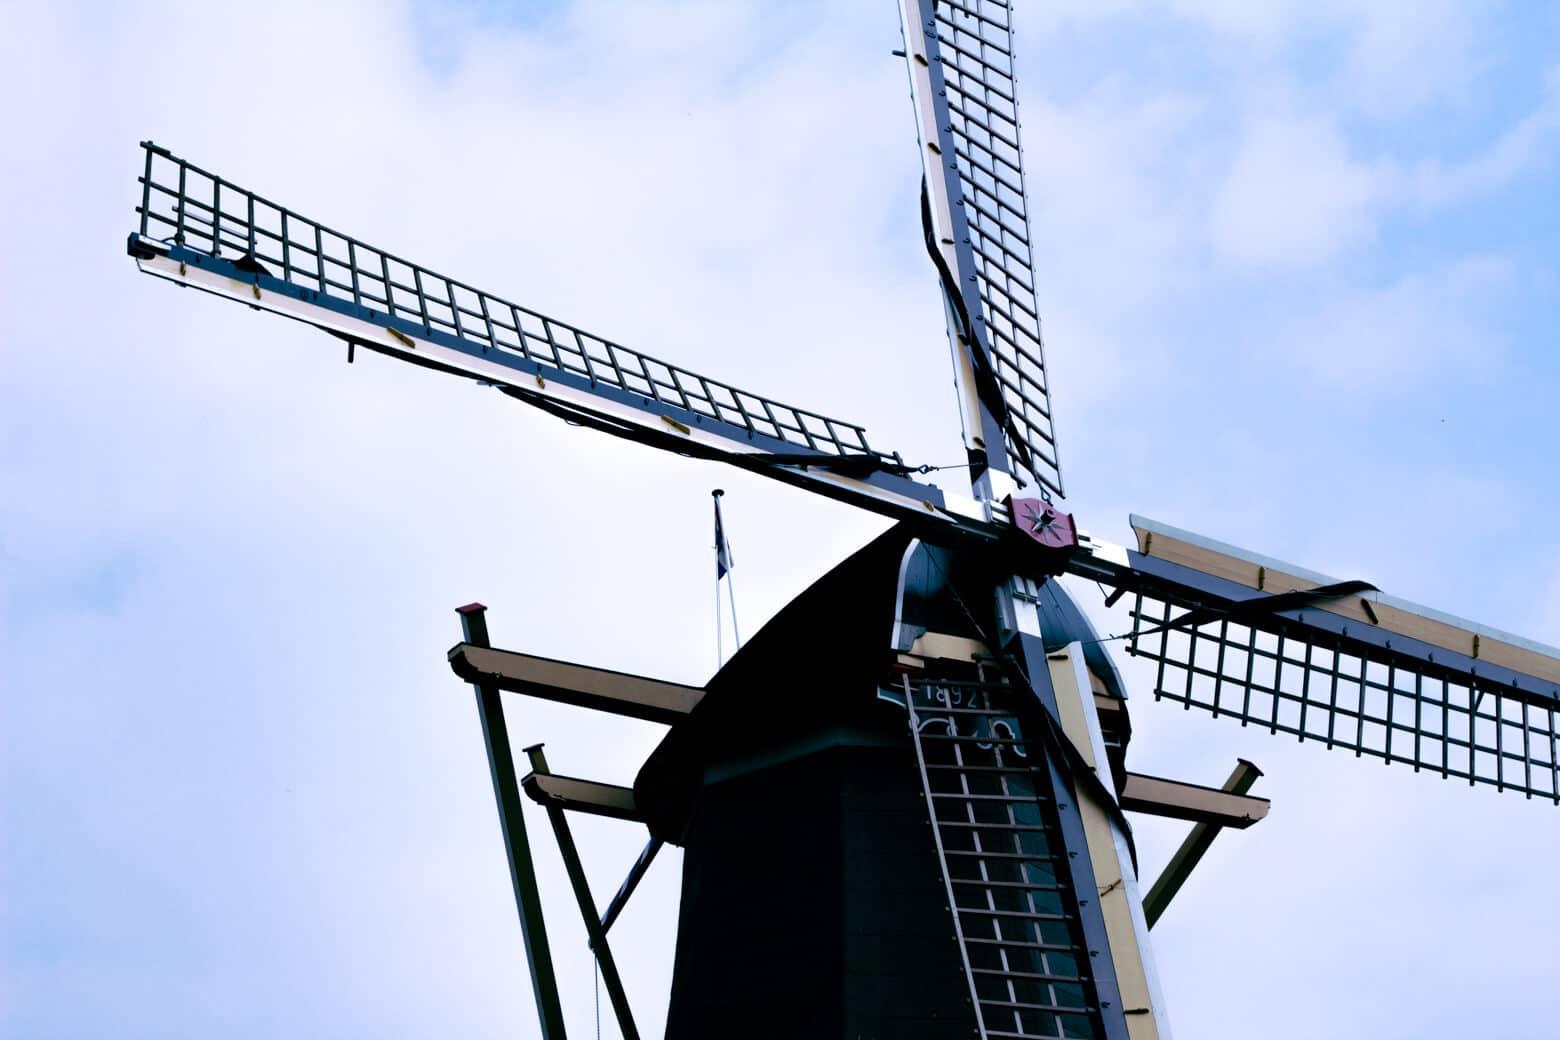 Dutch Windmill at Keukenhof in the Netherlands